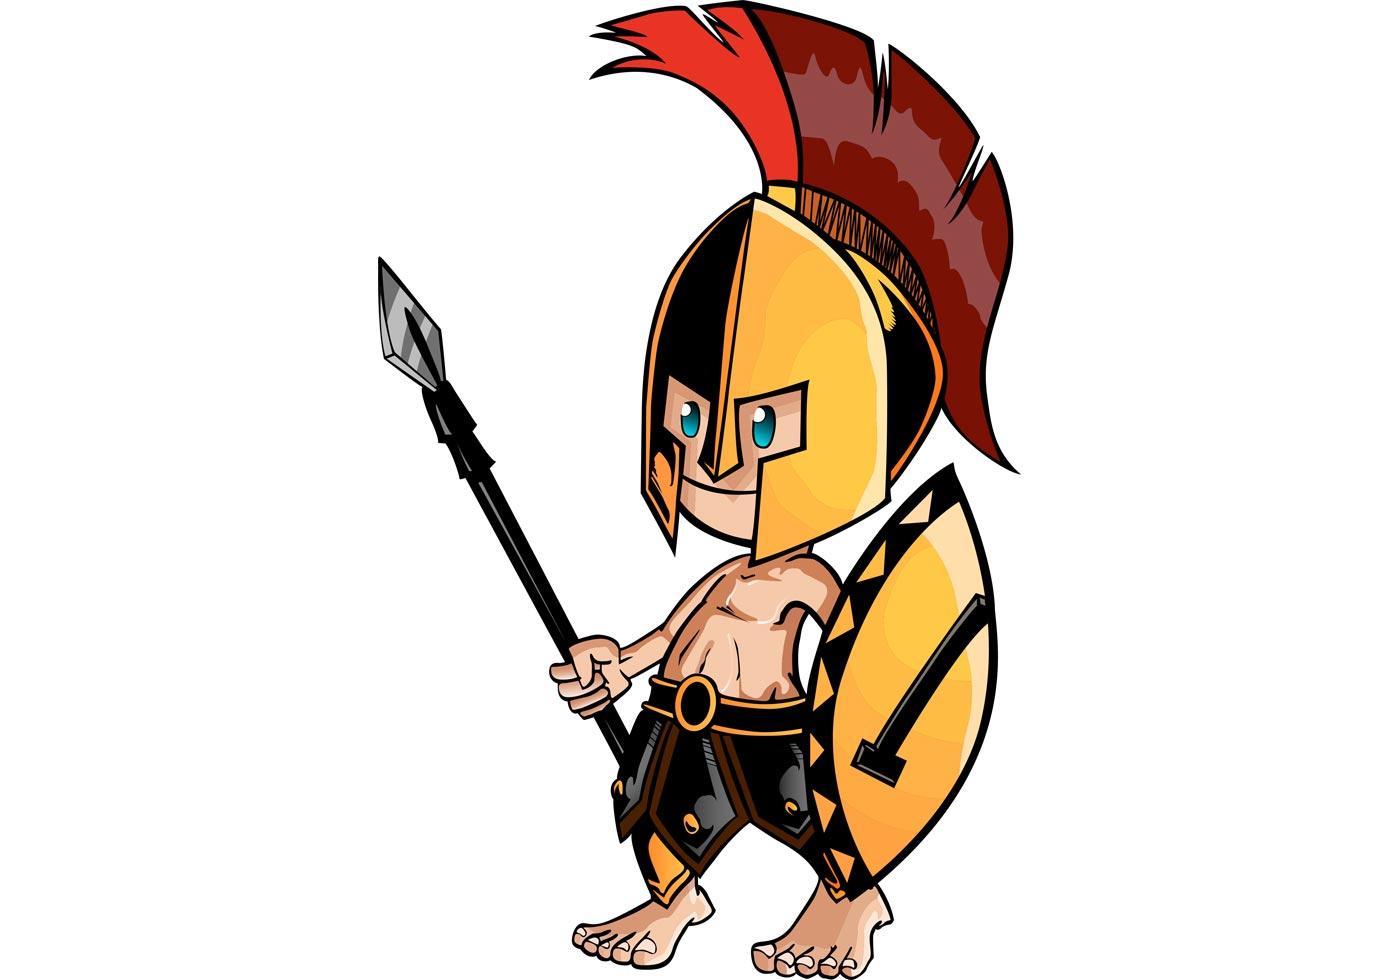 ... Spartan Cartoon - Download Free Vector Art, Stock Graphics & Images